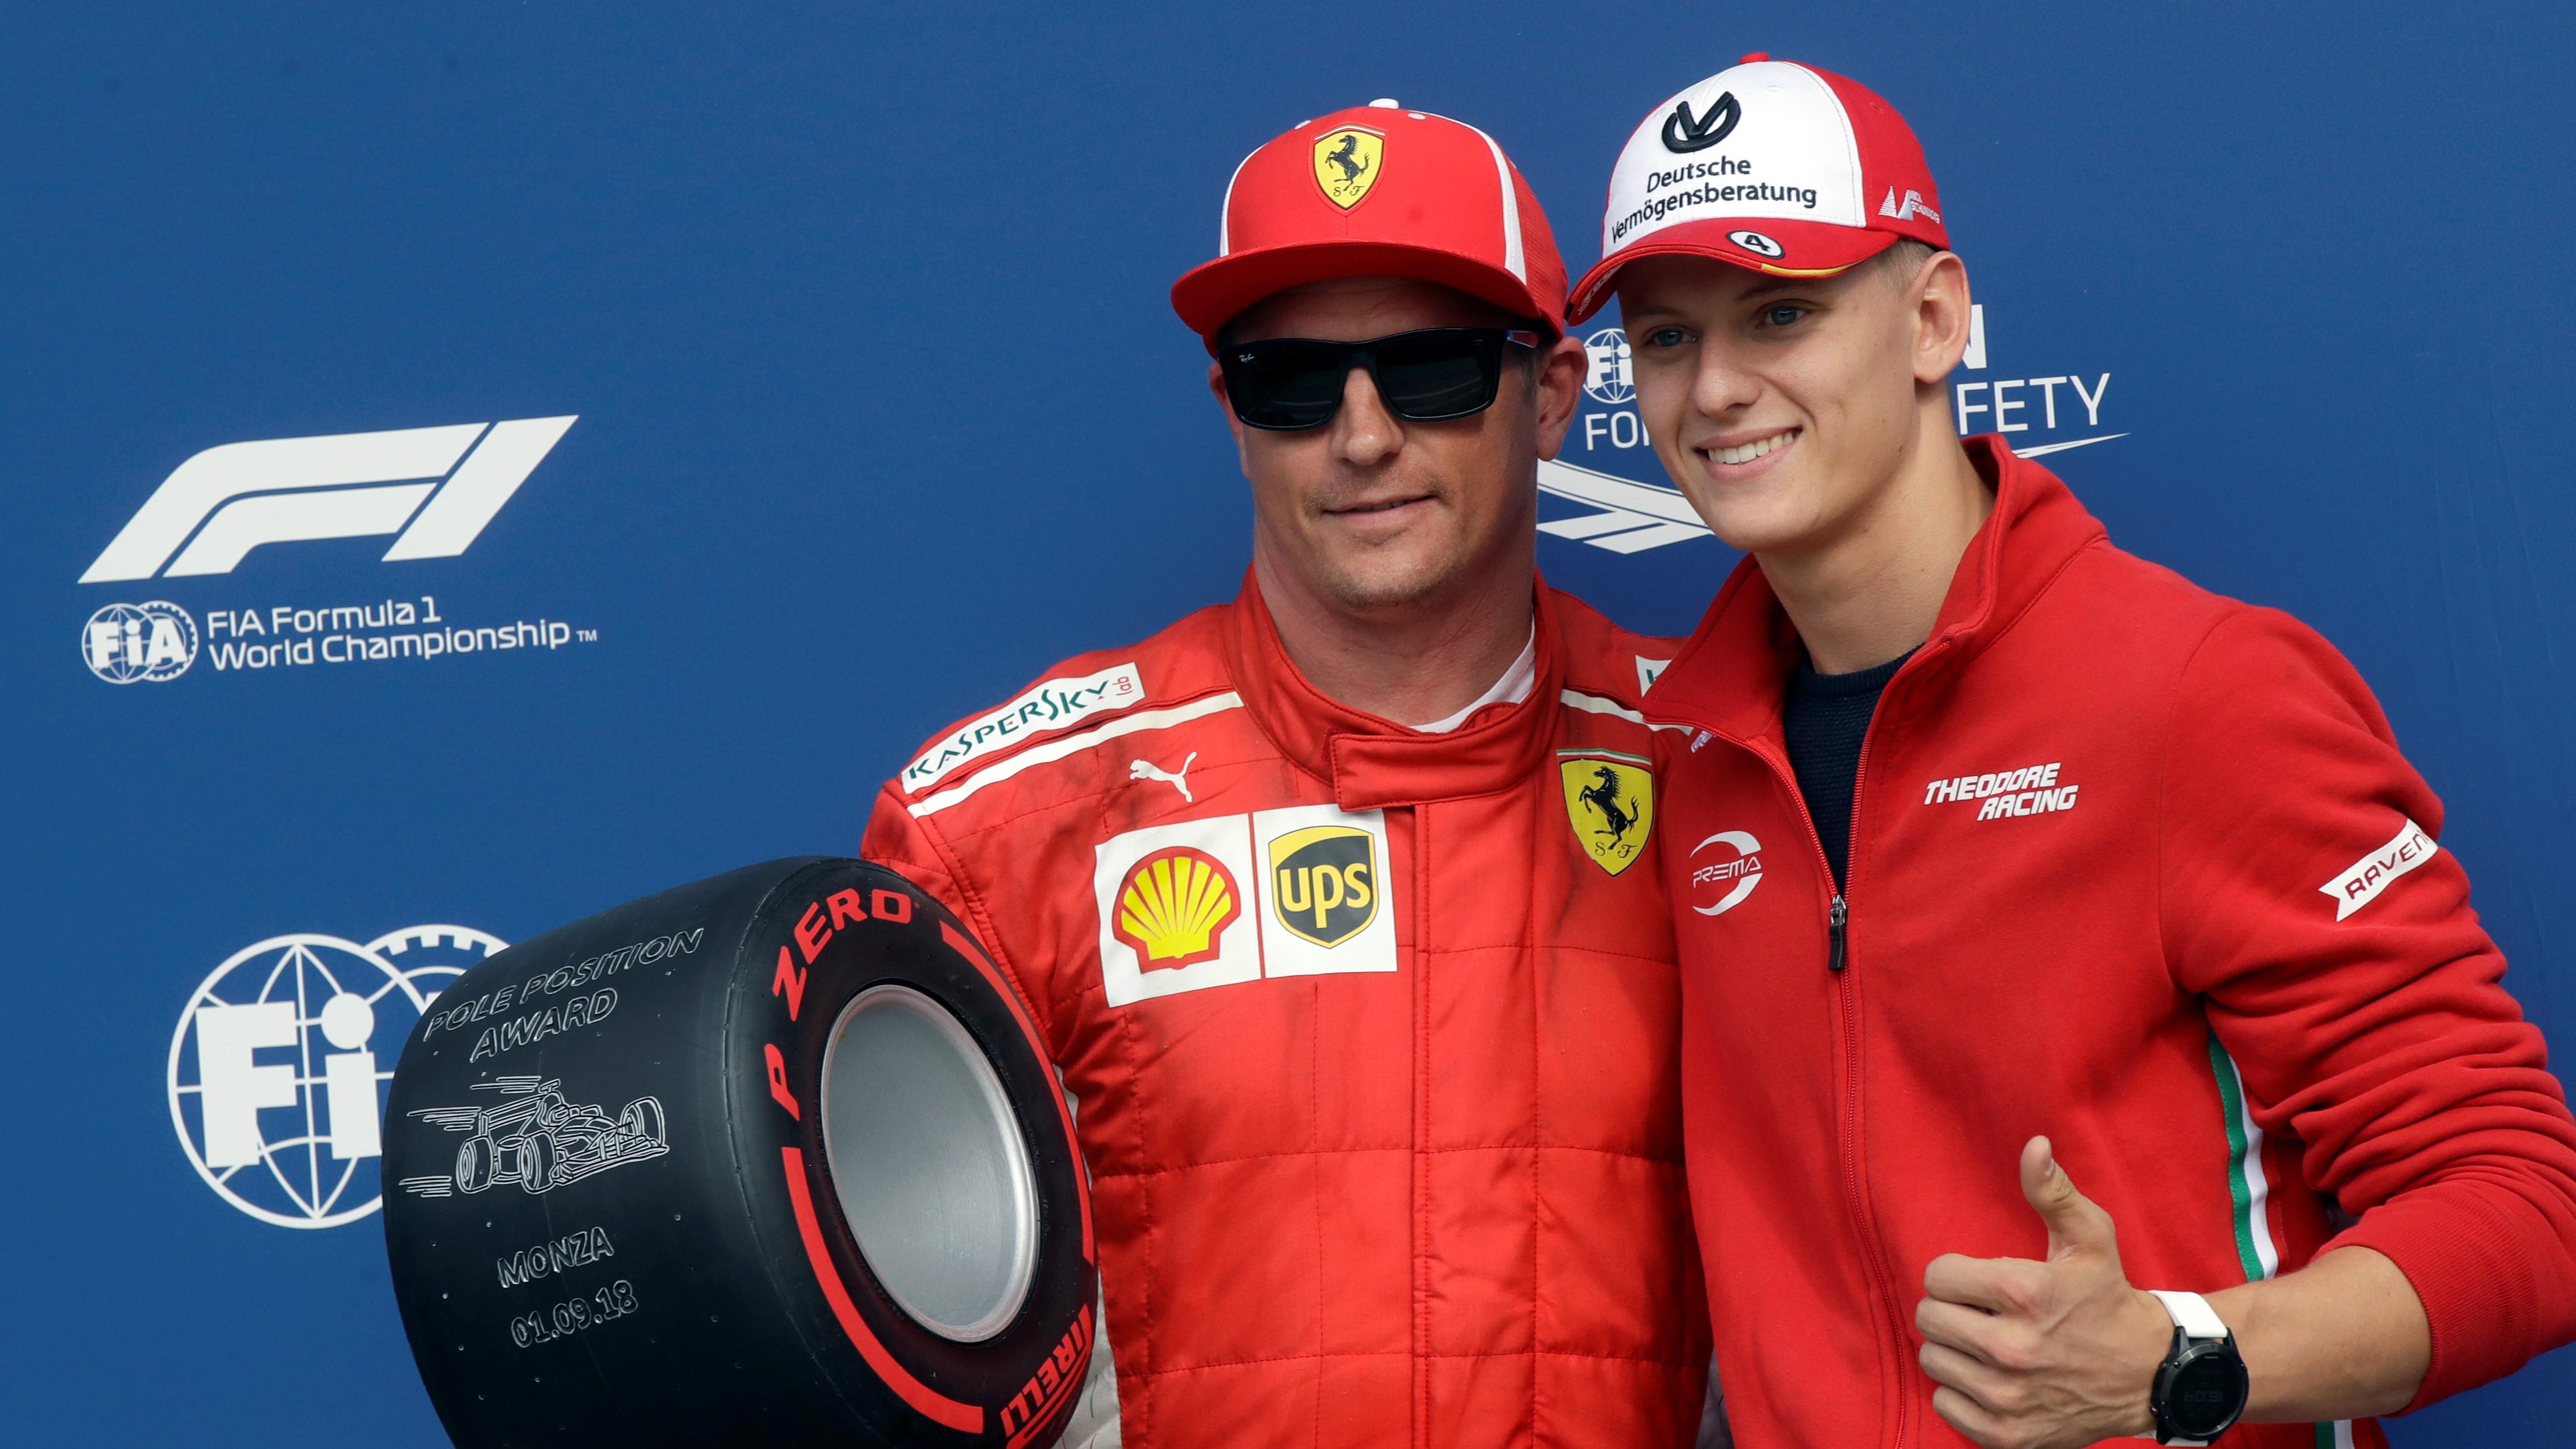 Mick Schumacher with Kimi Raikkonen.